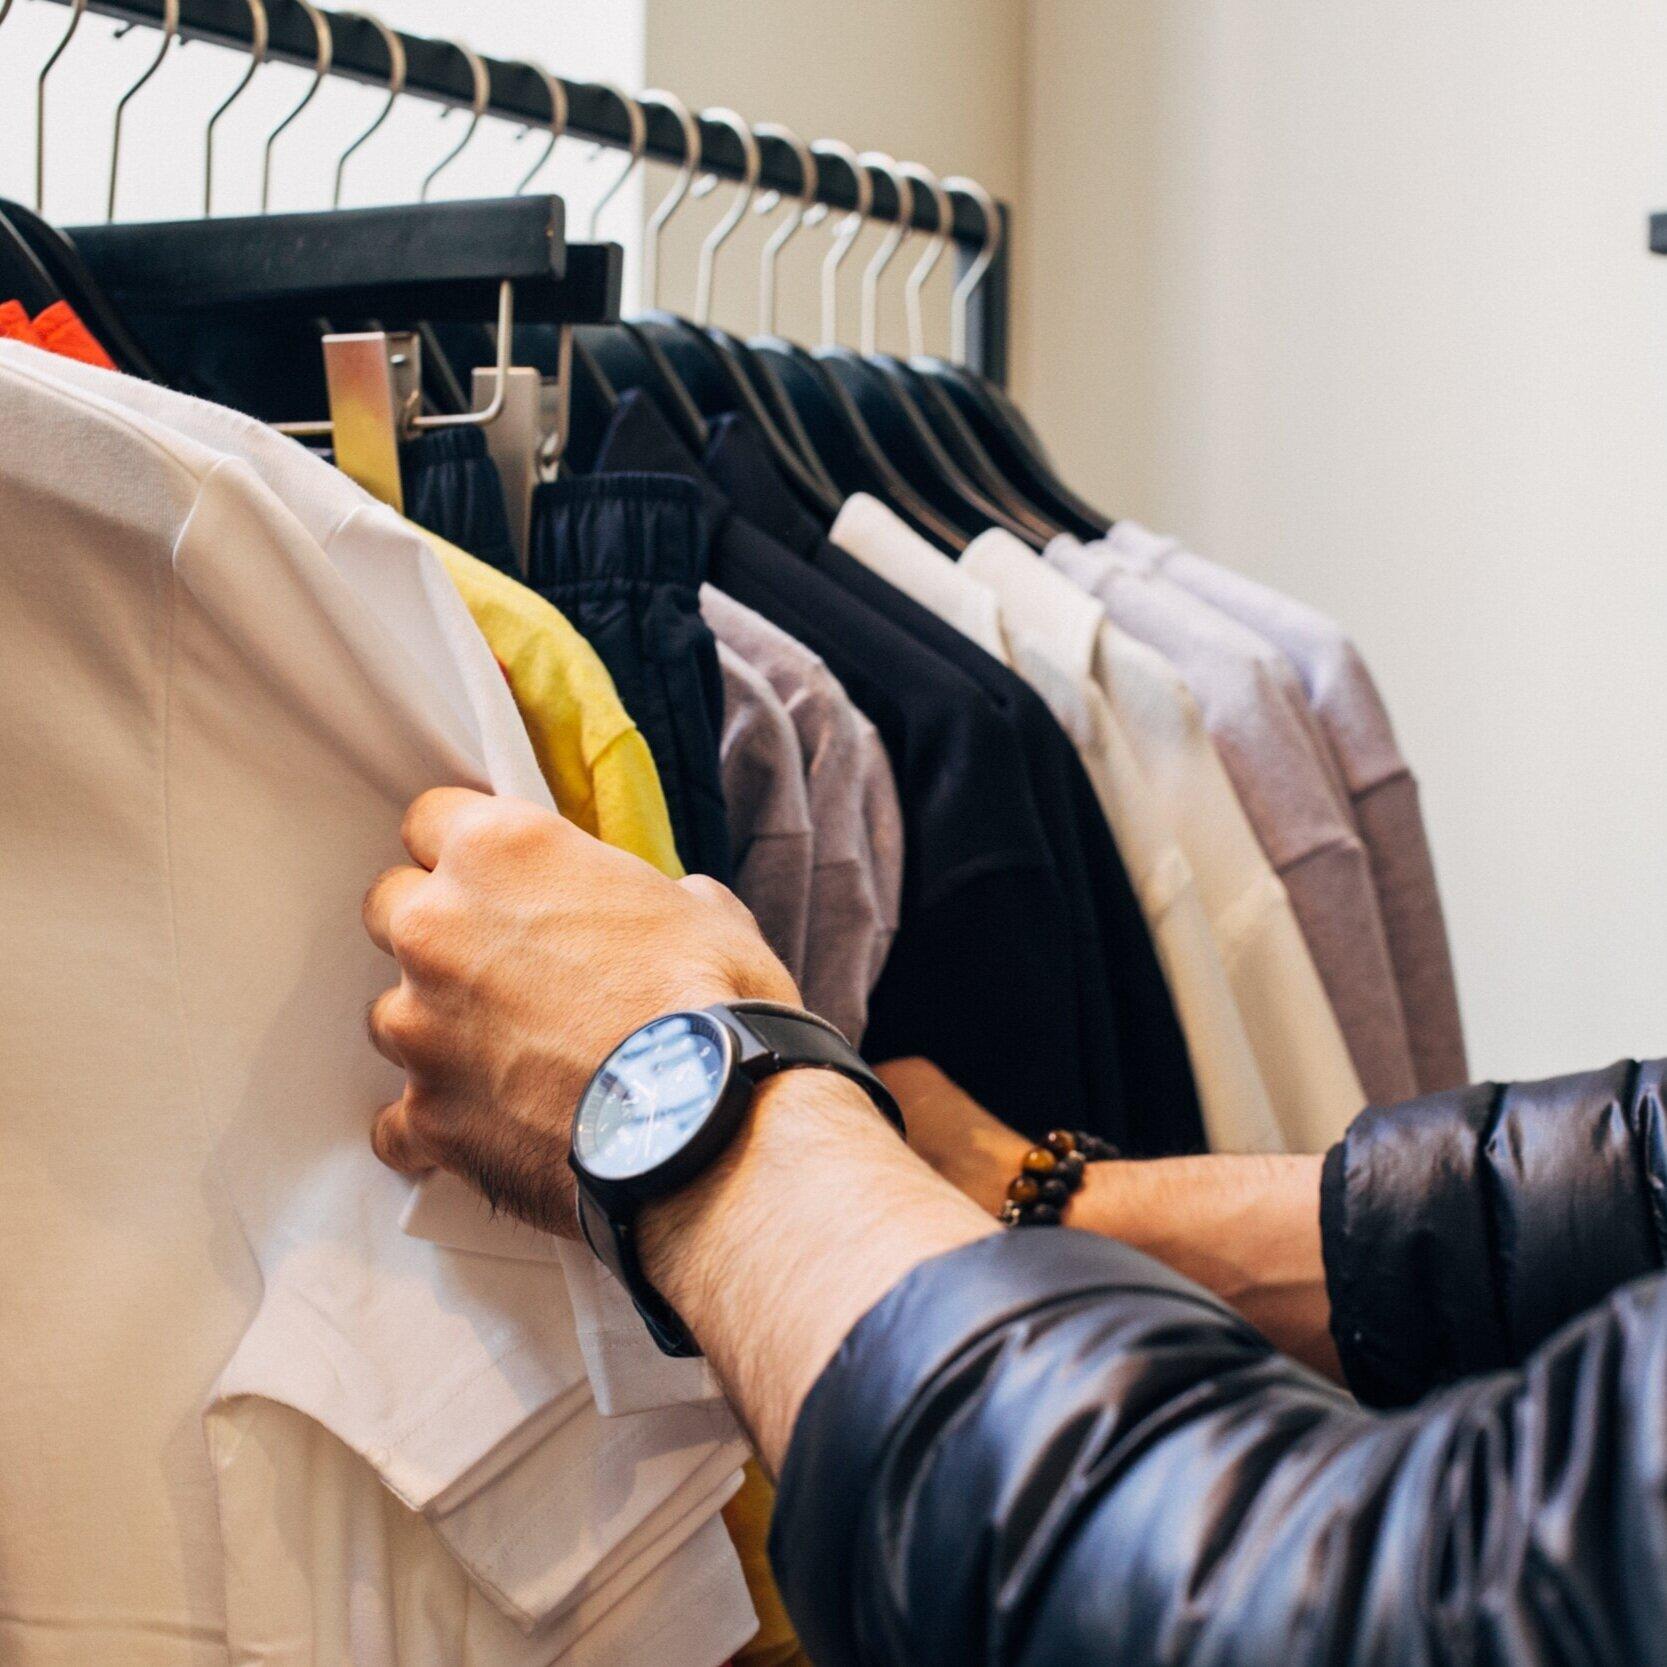 Where to shop: - - Intu Victoria Centre- The Royal Exchange- Lace Market (Vintage Clothing)- East Midlands Designer Outlet